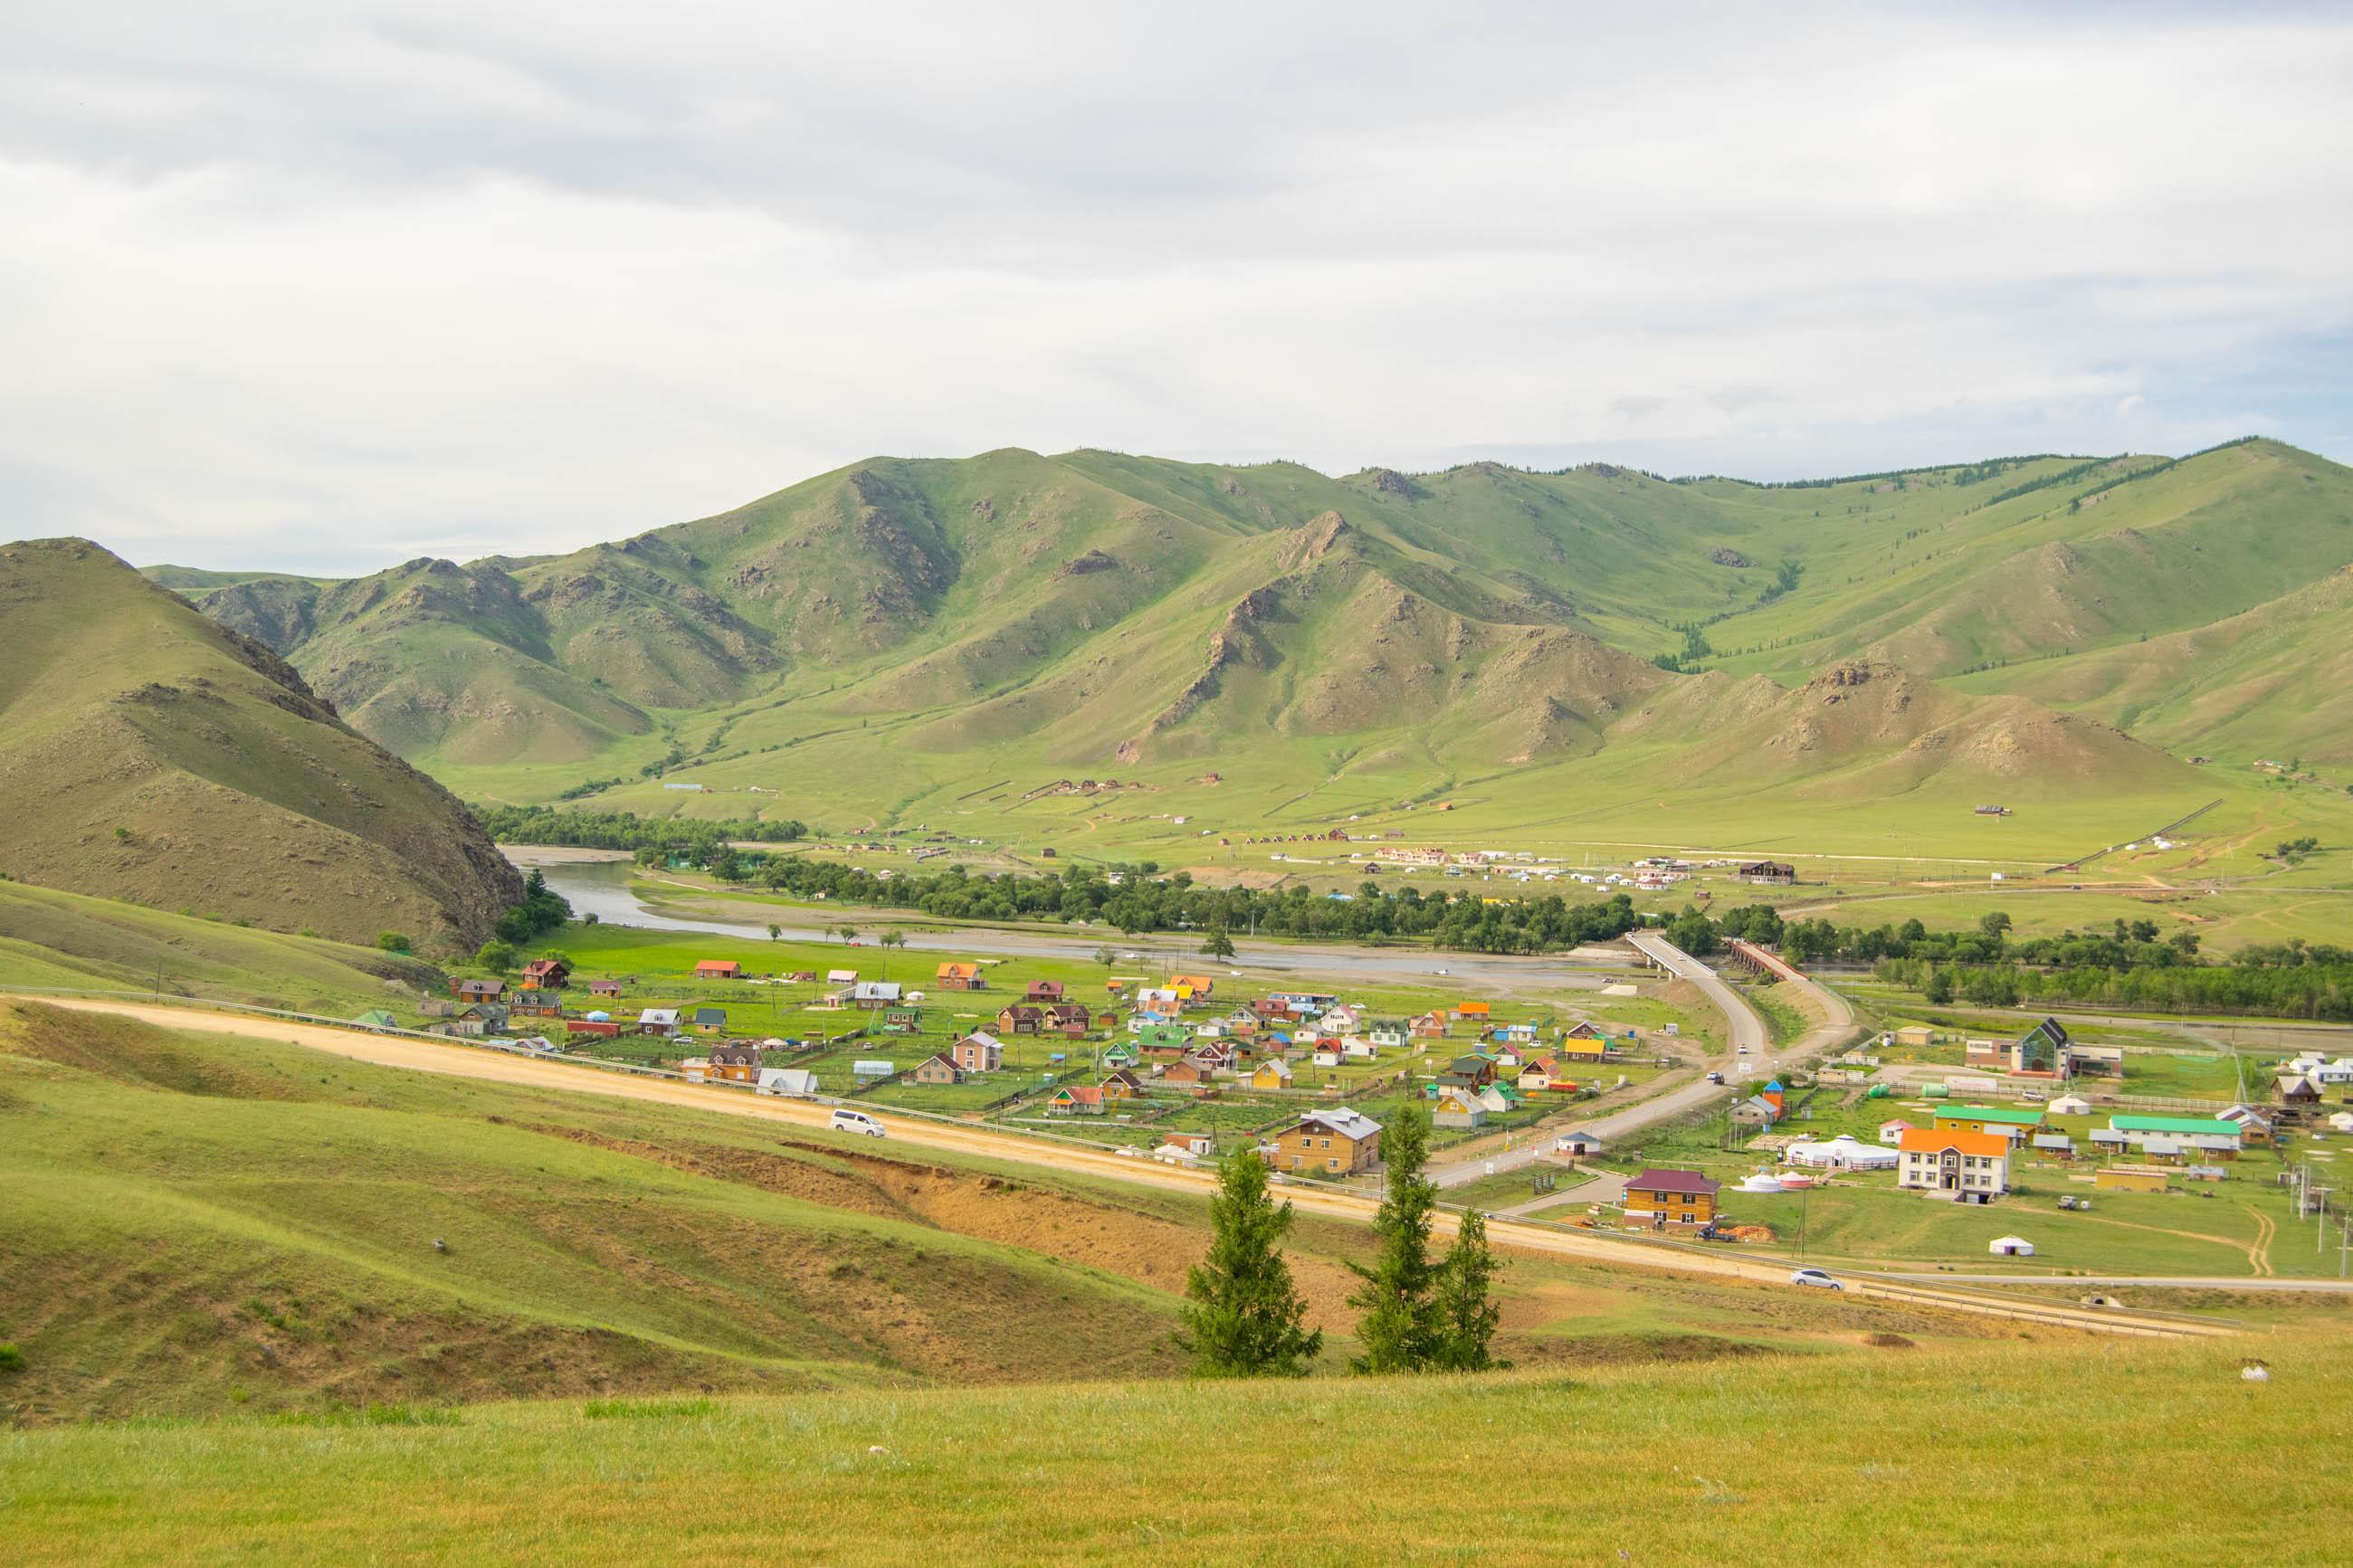 https://bubo.sk/uploads/galleries/4924/martinlipinsky_mongolsko_dsc0665.jpg